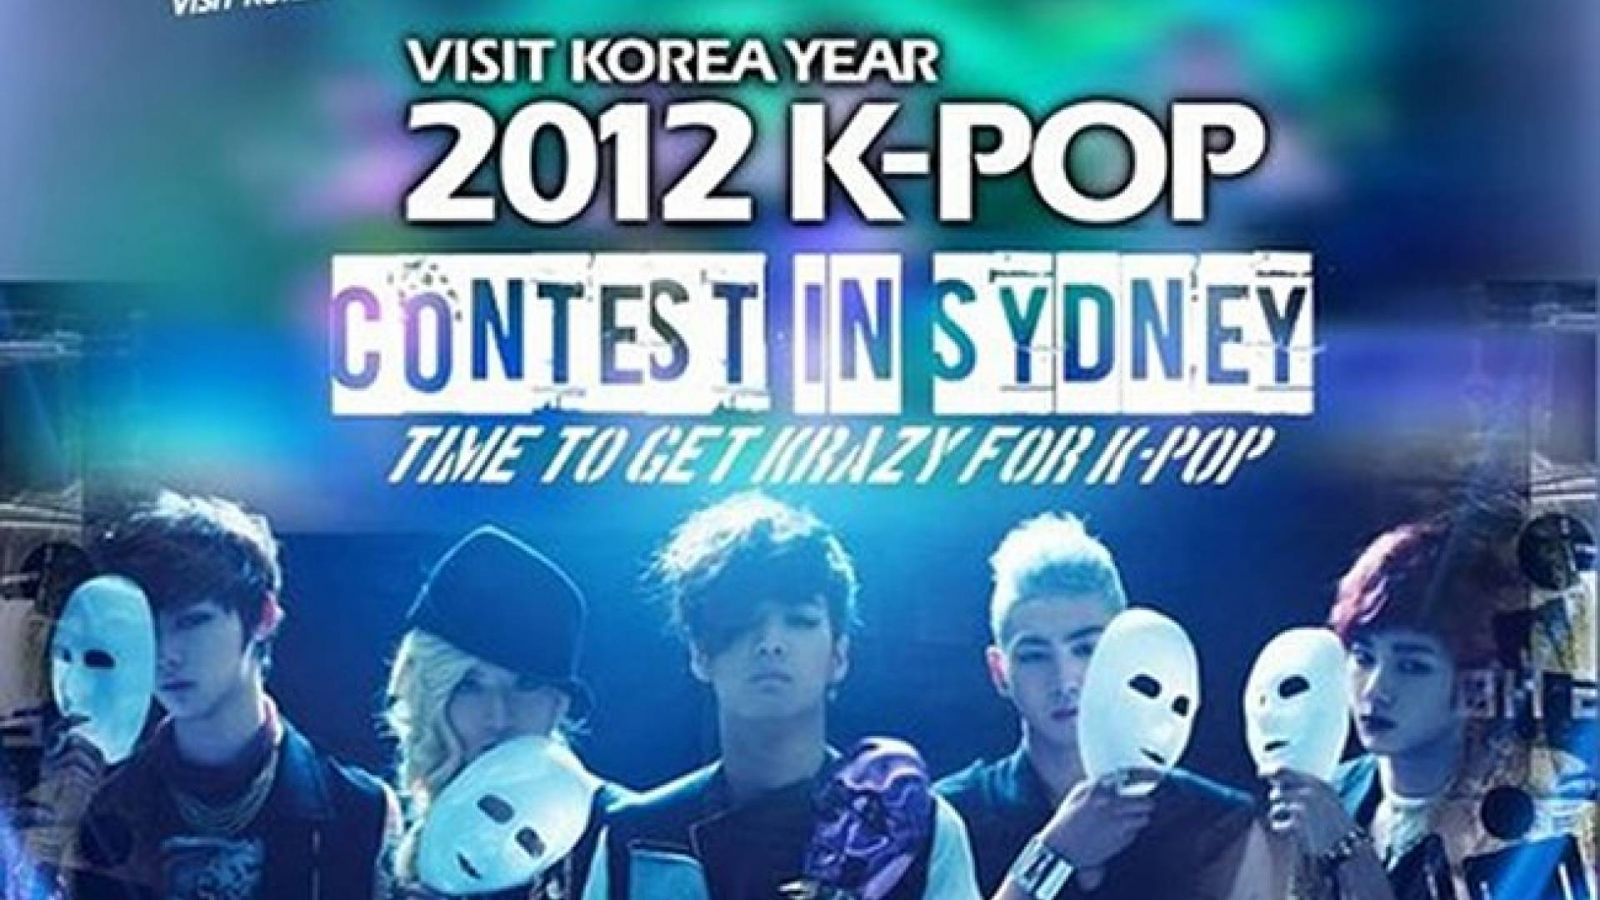 NU'EST julgará concurso de K-pop em Sydney © Visit KOREA Committee